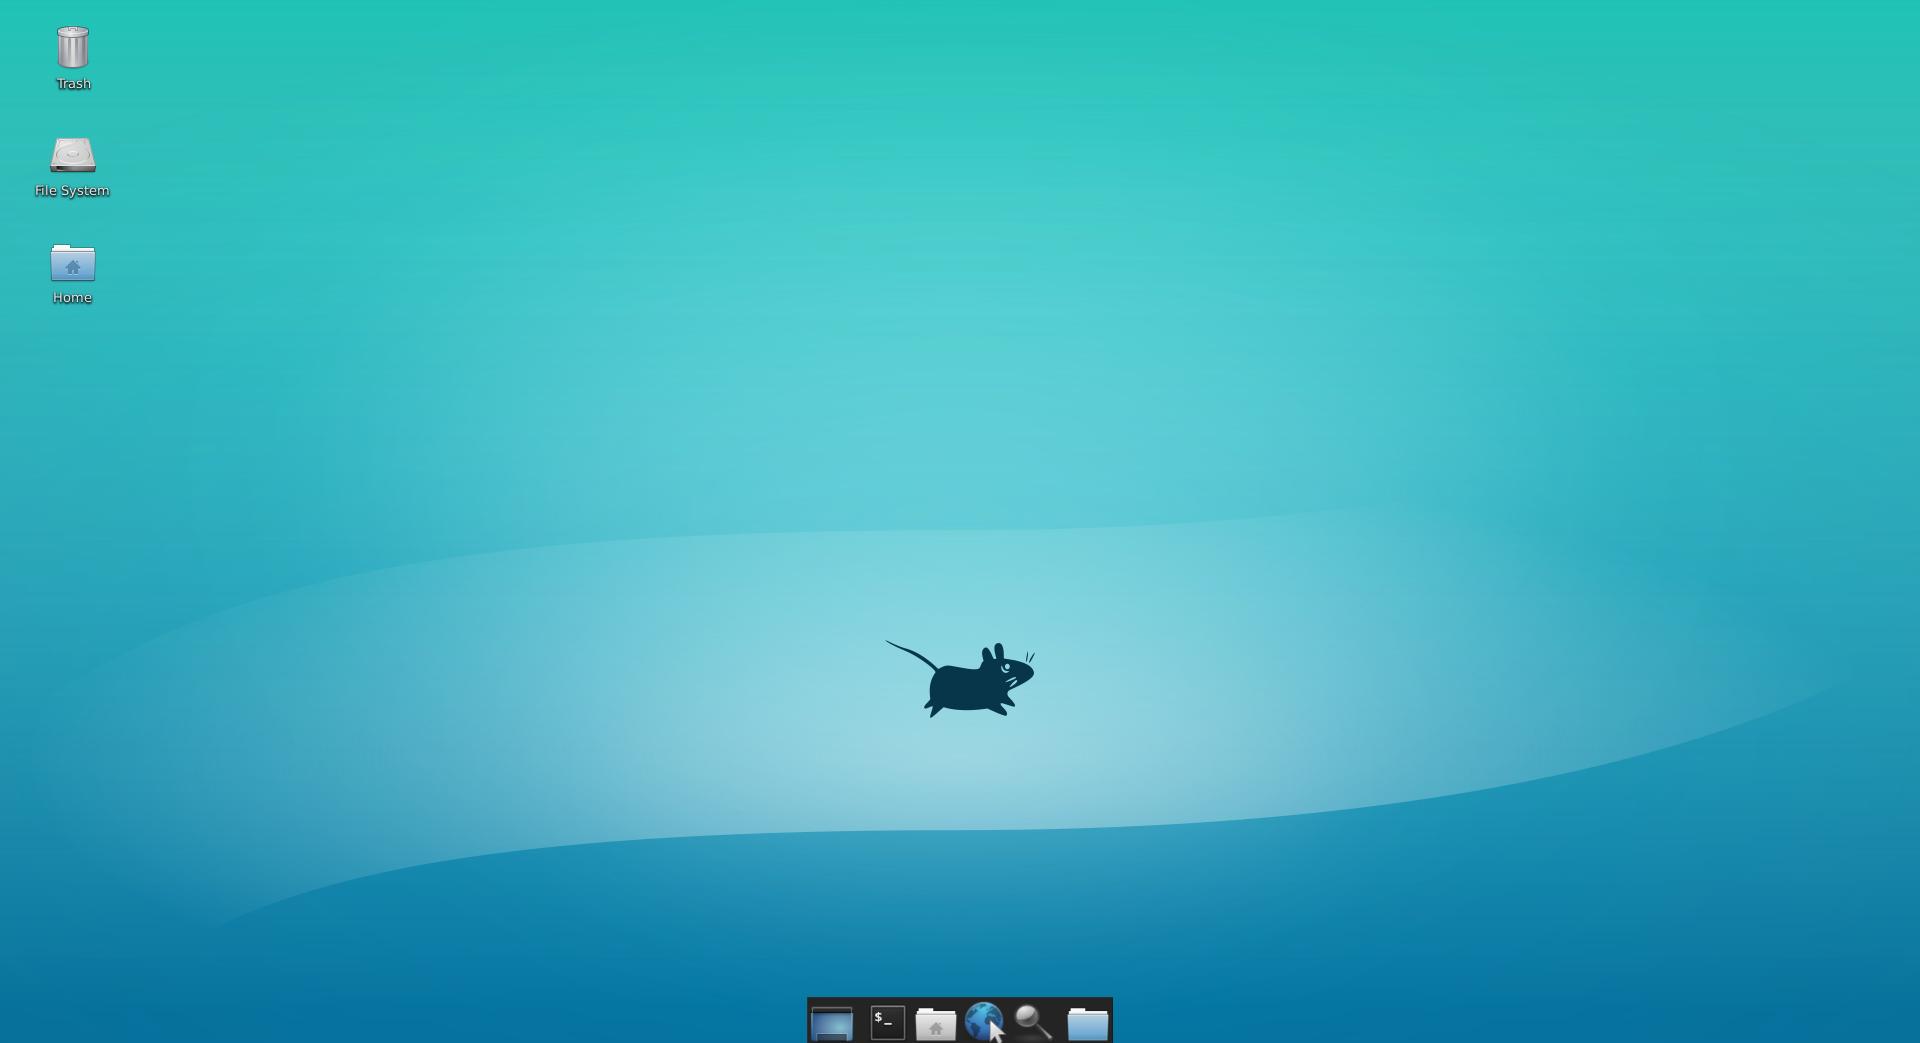 ¿Cómo usar xRDP para conexión remota en Ubuntu?